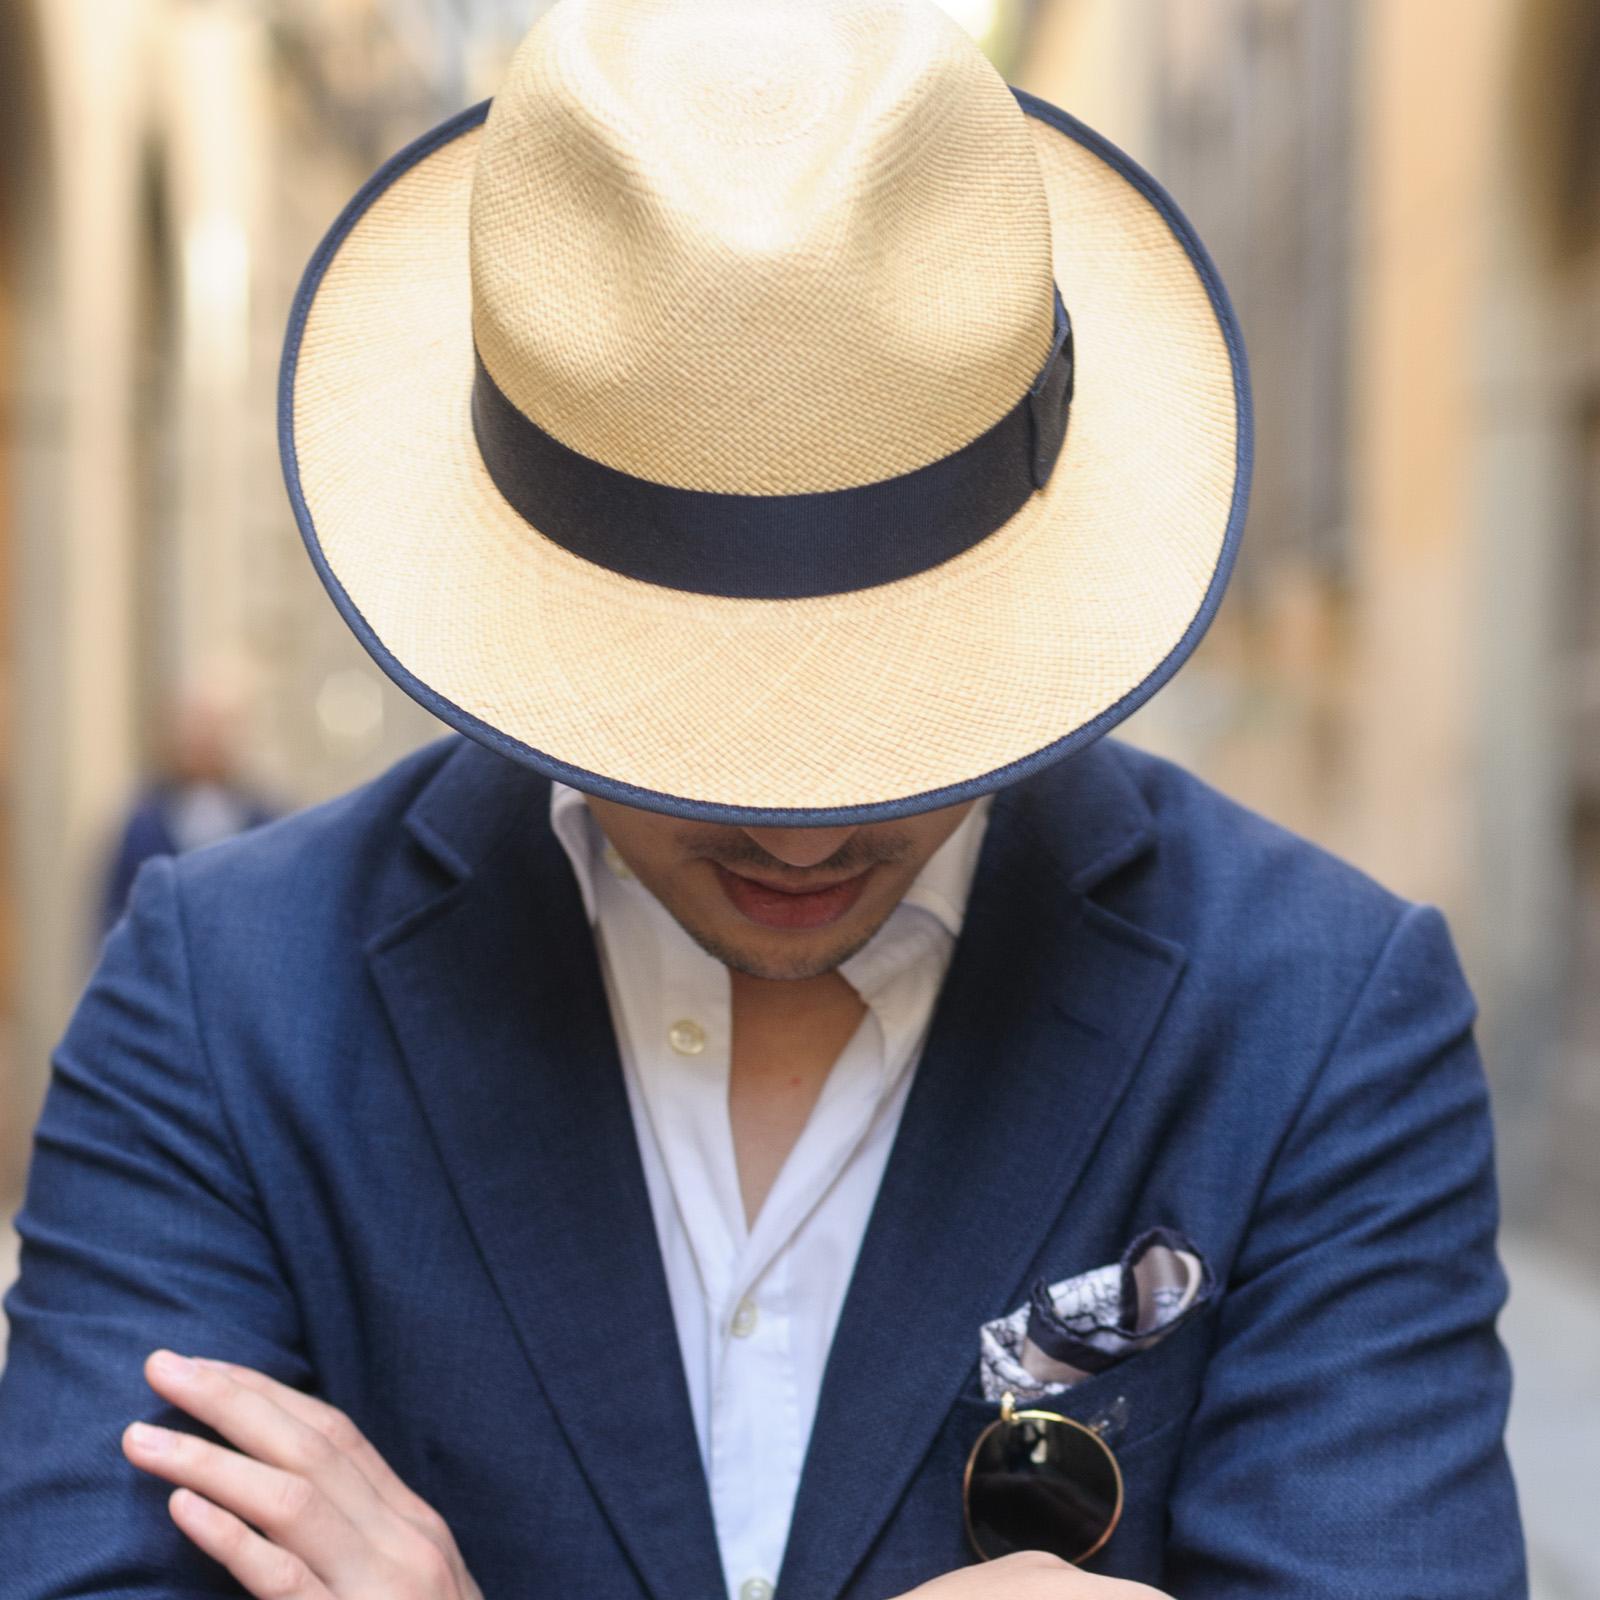 Lana Fresco, Navy Blazer, Herringbone Australia, Uniqlo Chinos, Crockett & Jones Loafers, Christys' Hats, Orient Star, Ray-ban